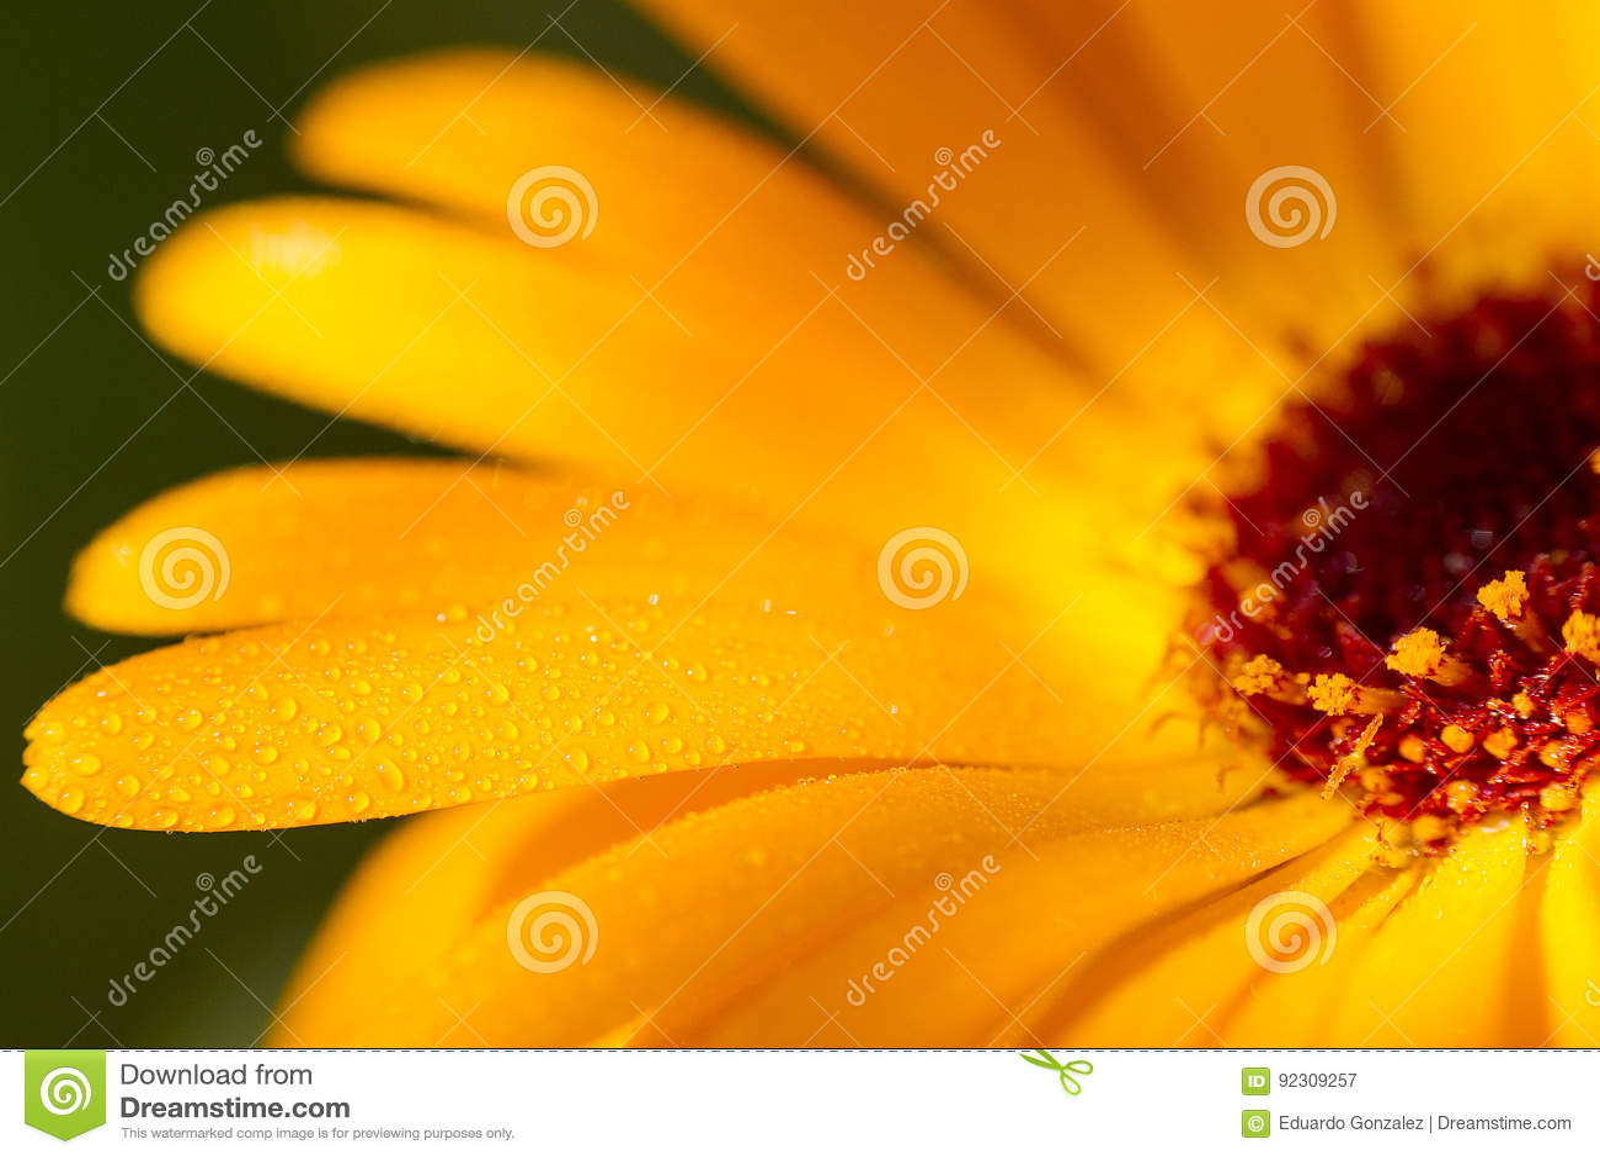 Closeup Of Yellow Daisy Stock Image Image Of Yellow 92309257